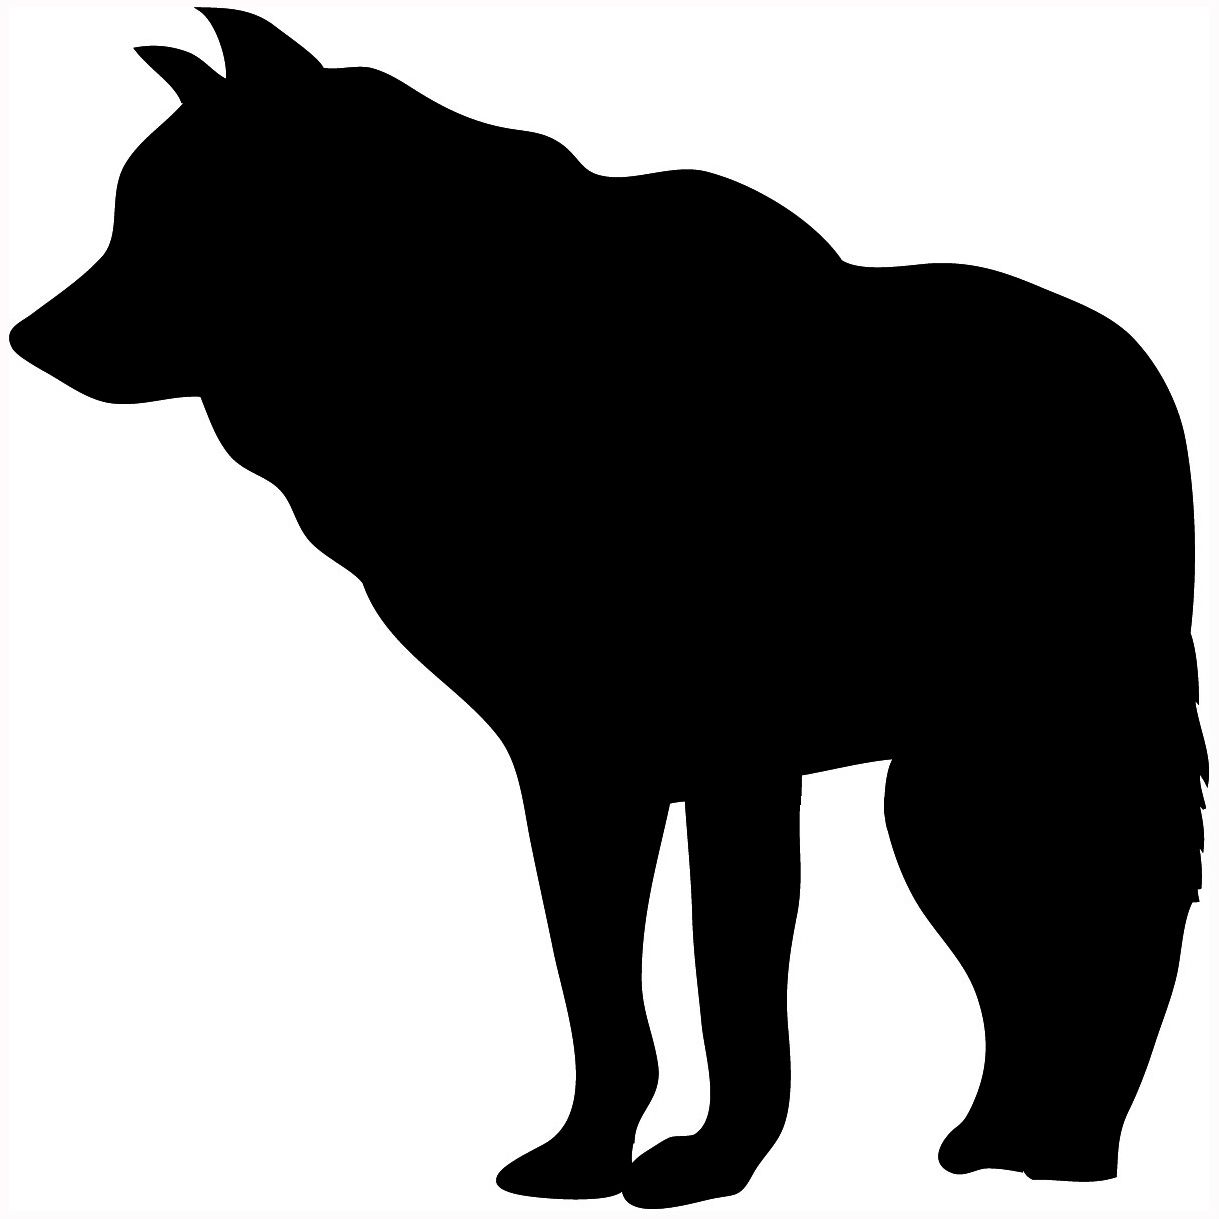 1219x1219 Animal Silhouette